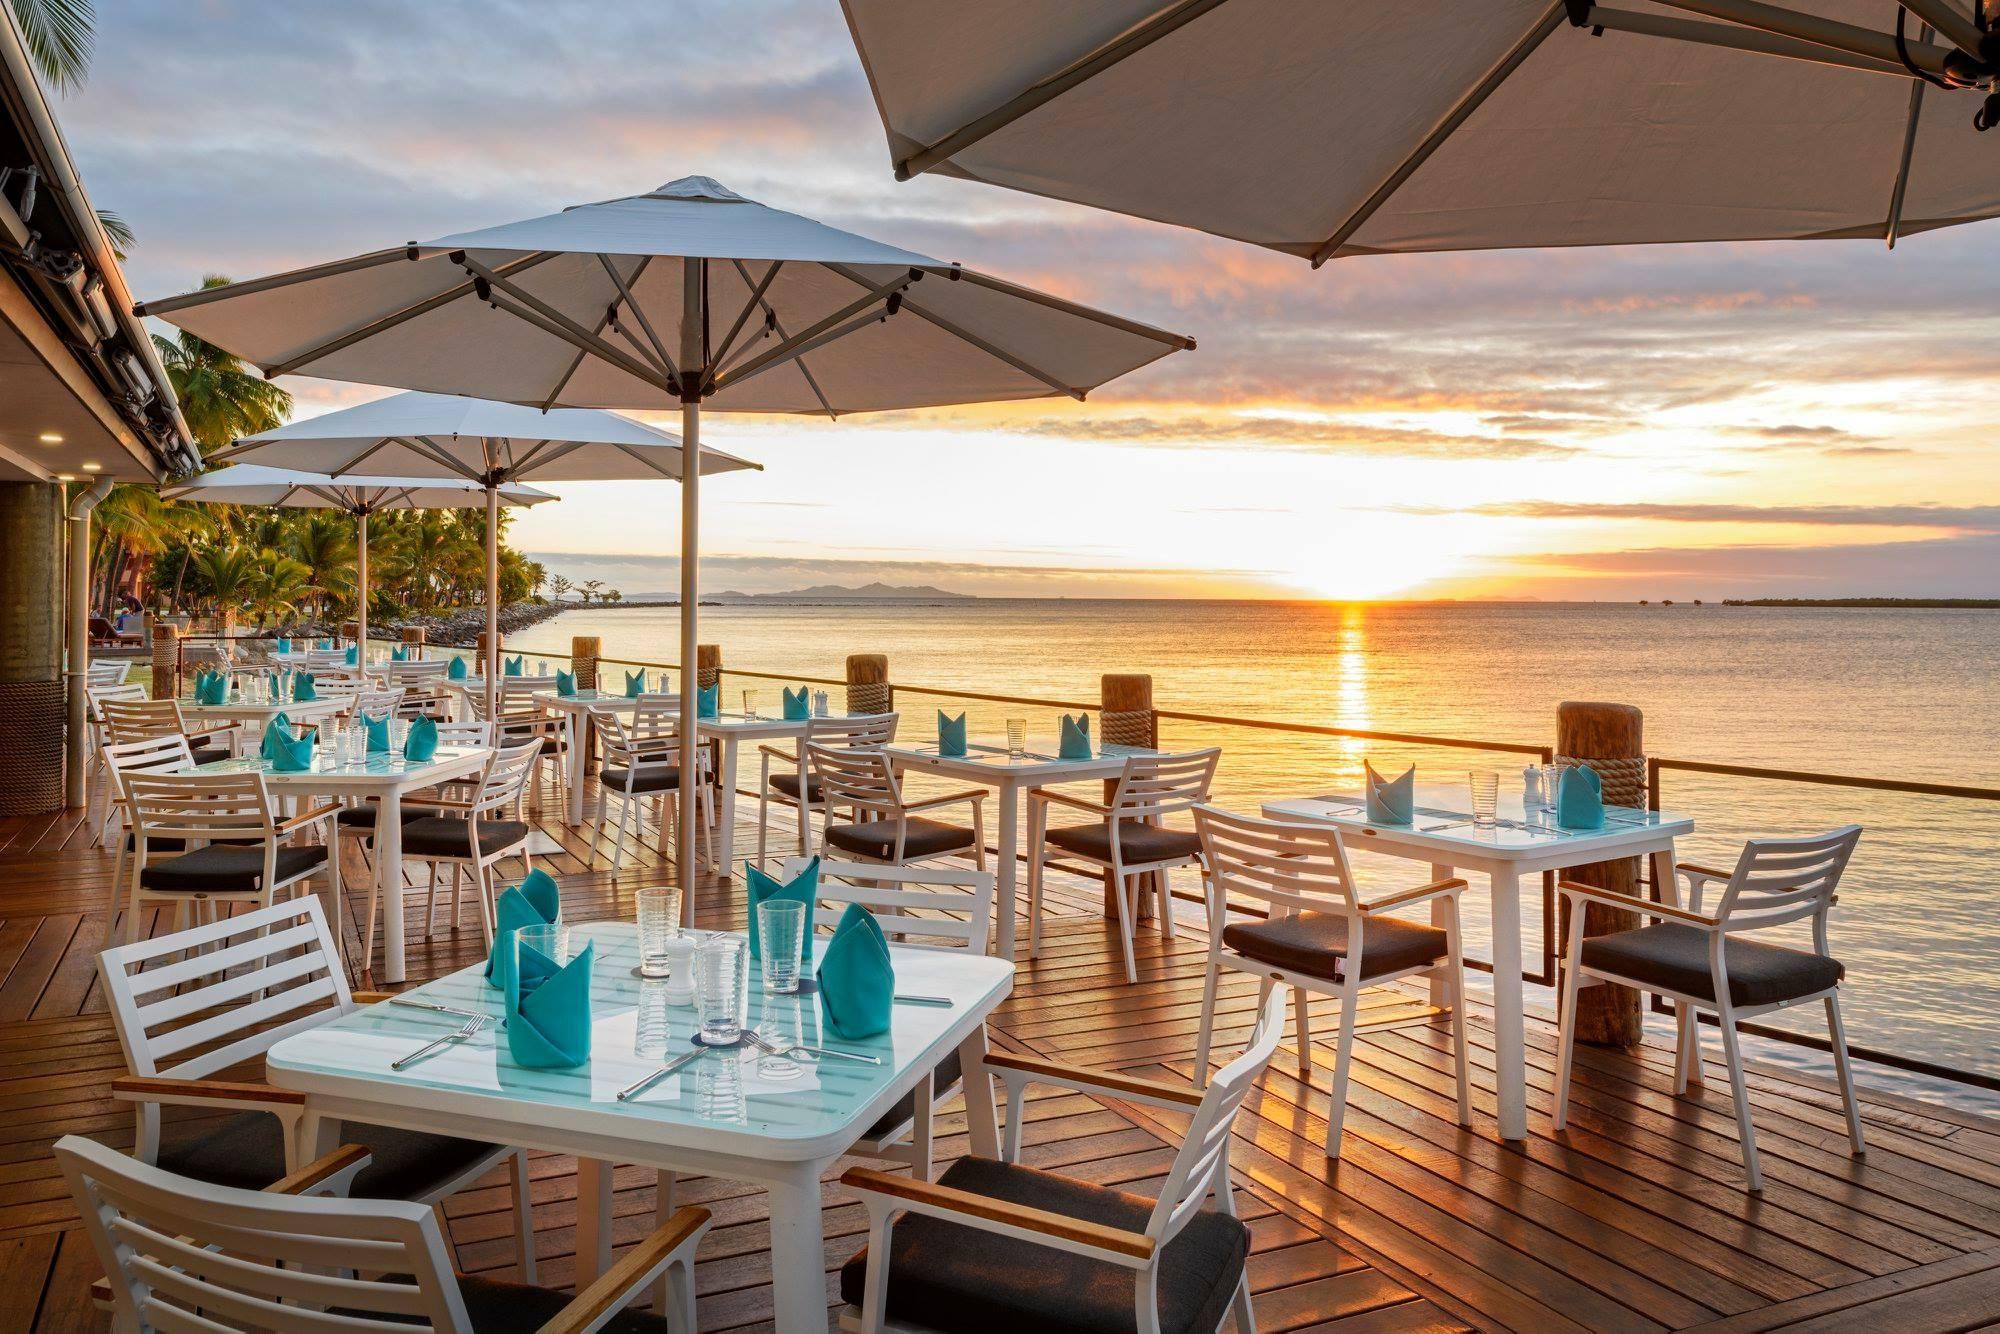 Sheraton Denarau Villas Wet Edge Restaurant Monaco Commercial Outdoor Umbrellas